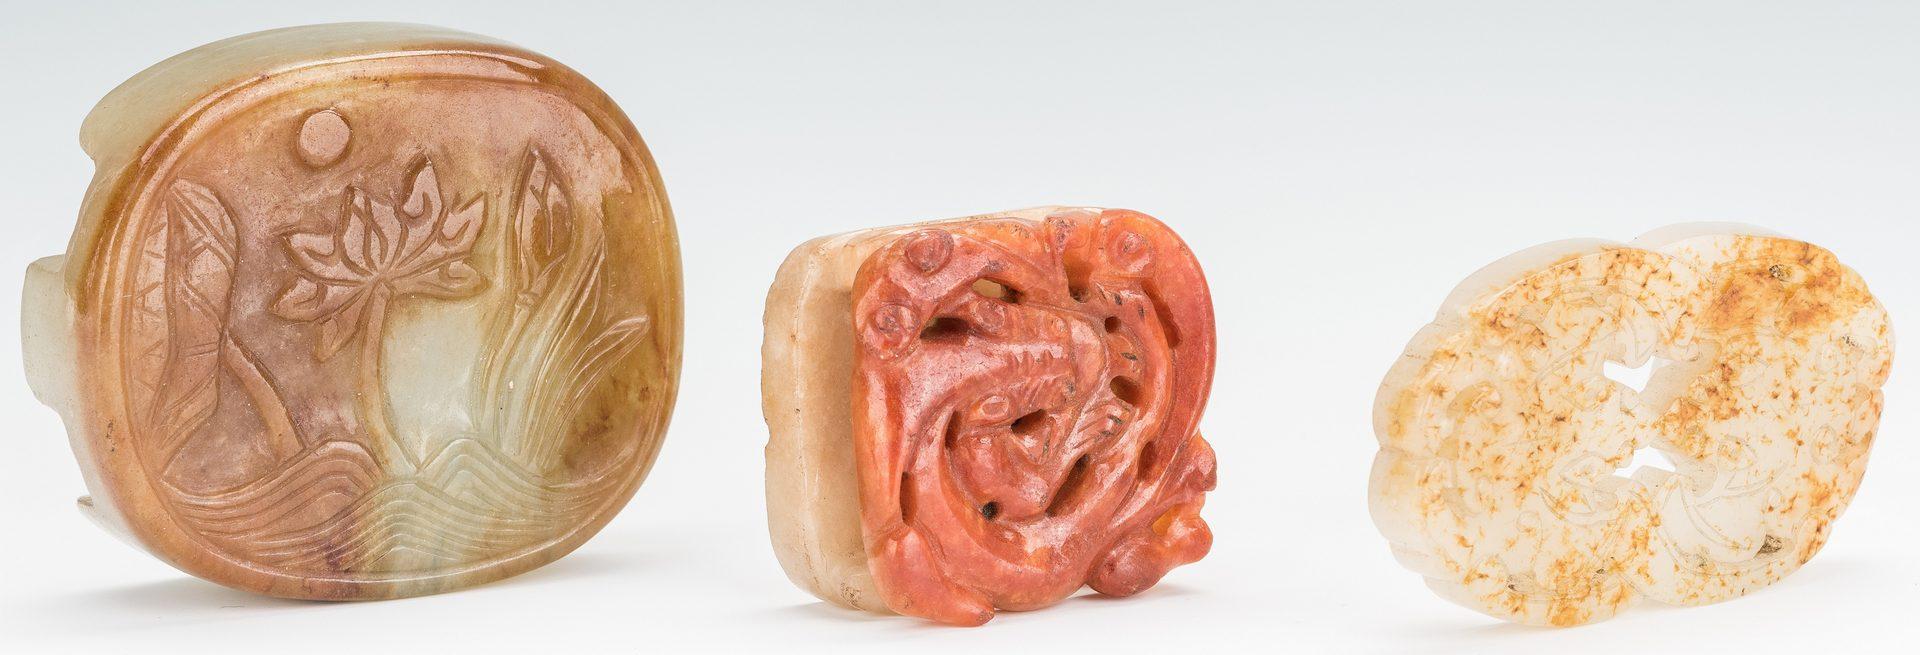 Lot 5: 3 Chinese Celadon & Russet Jade Buckles